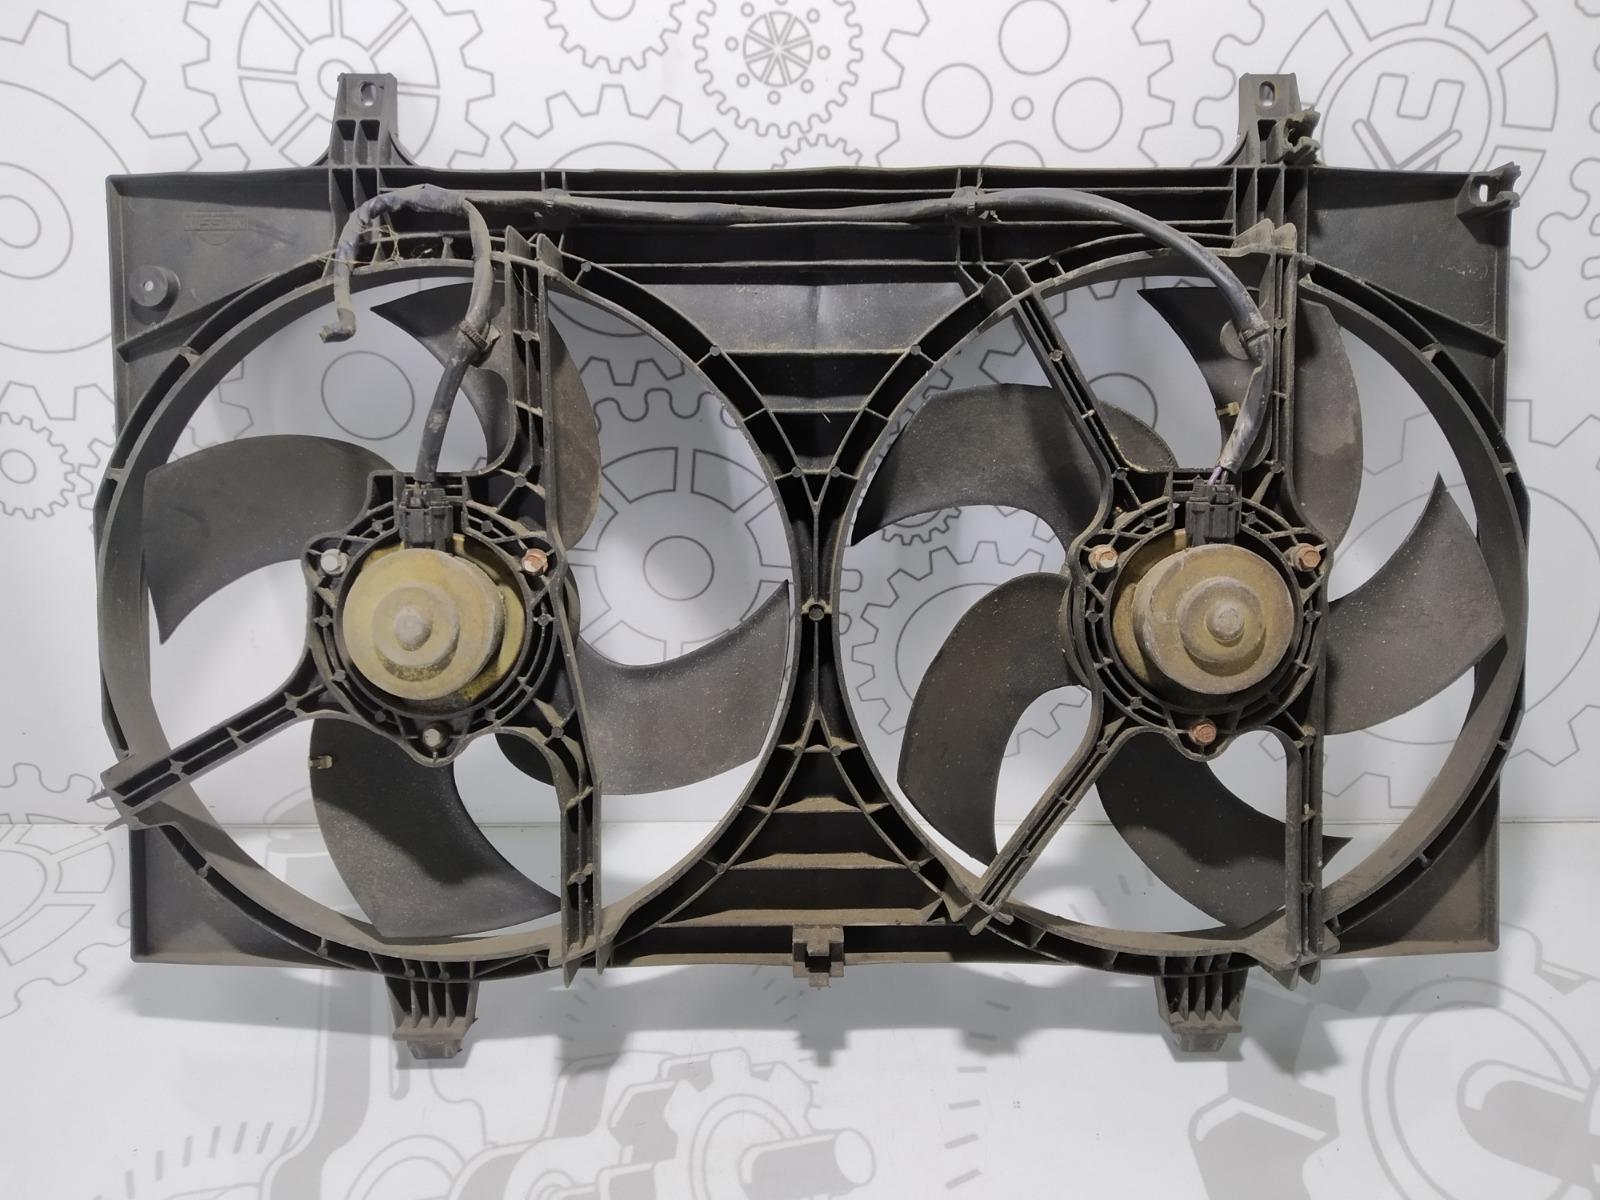 Вентилятор радиатора Nissan Almera Tino 1.8 I 2005 (б/у)